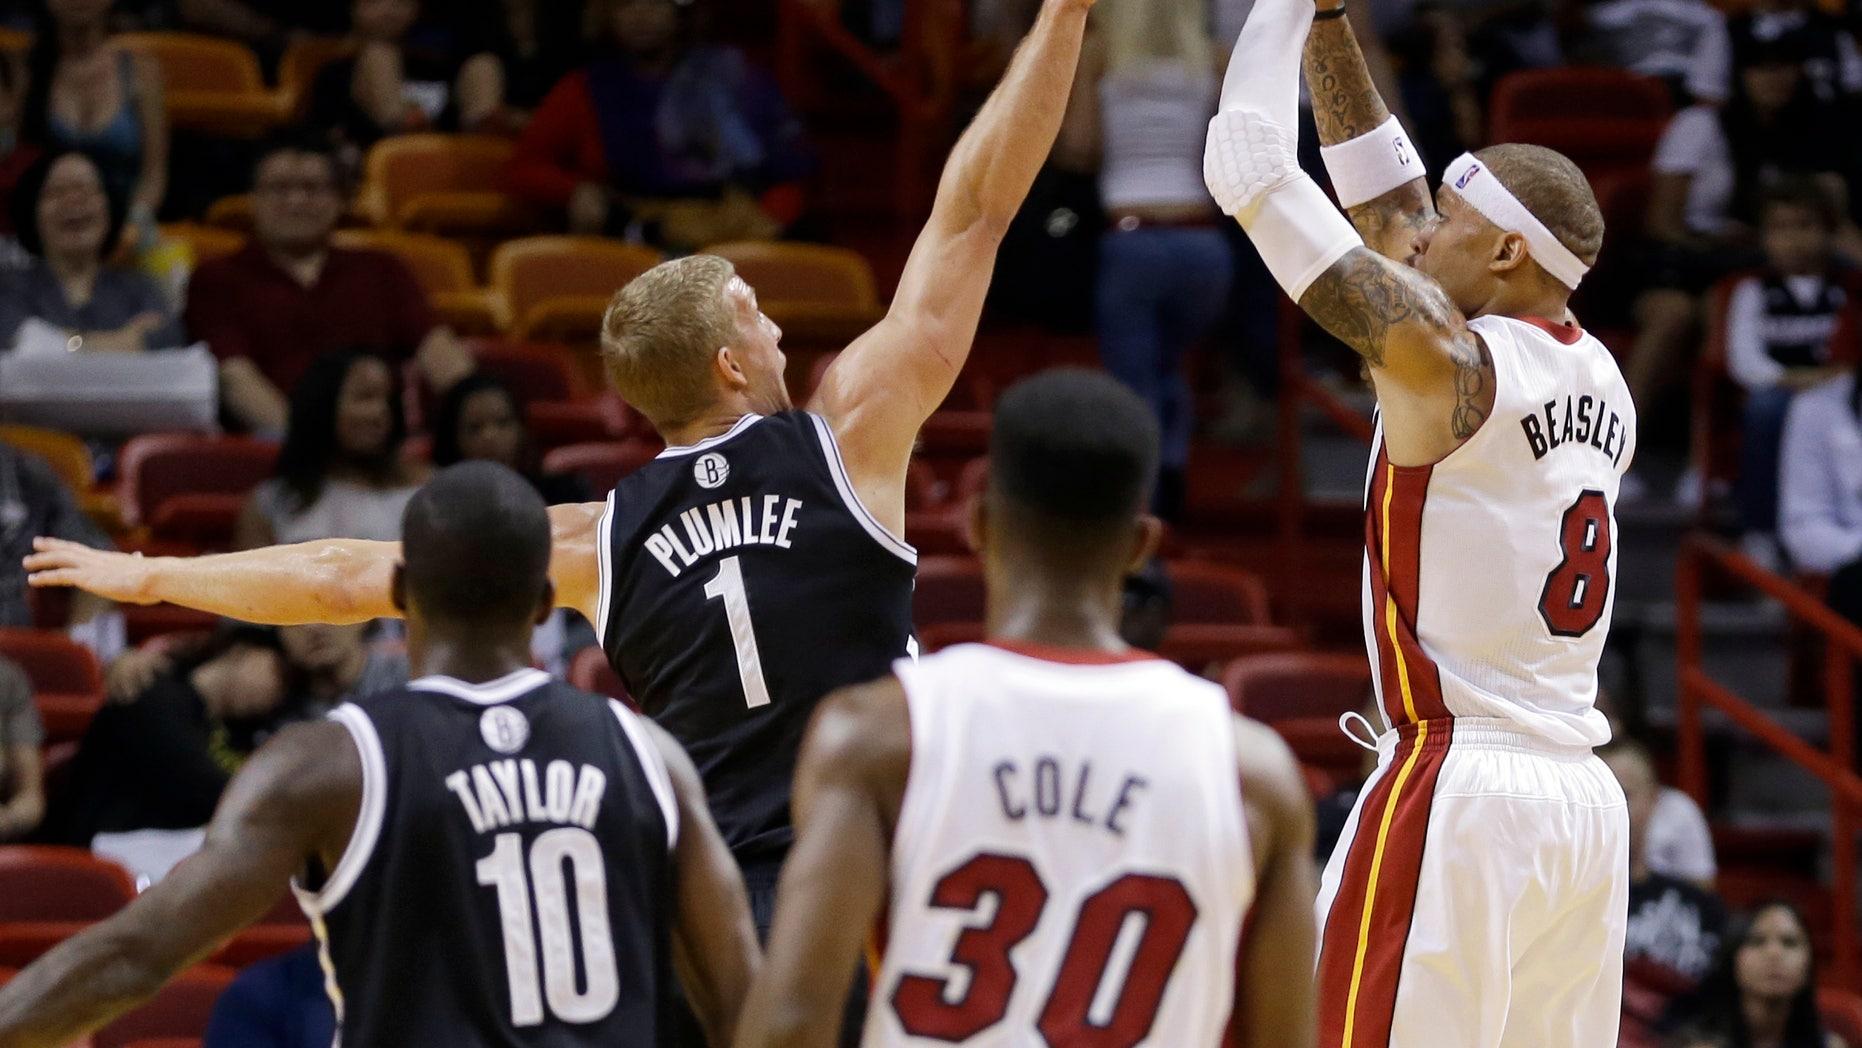 Miami Heat small forward Michael Beasley (8) prepares to take a shot as Brooklyn Nets power forward Mason Plumlee (1) defends in the fourth quarter of an NBA preseason basketball game, Friday, Oct. 25, 2013, in Miami. The Nets won 108-87. (AP Photo/Alan Diaz)